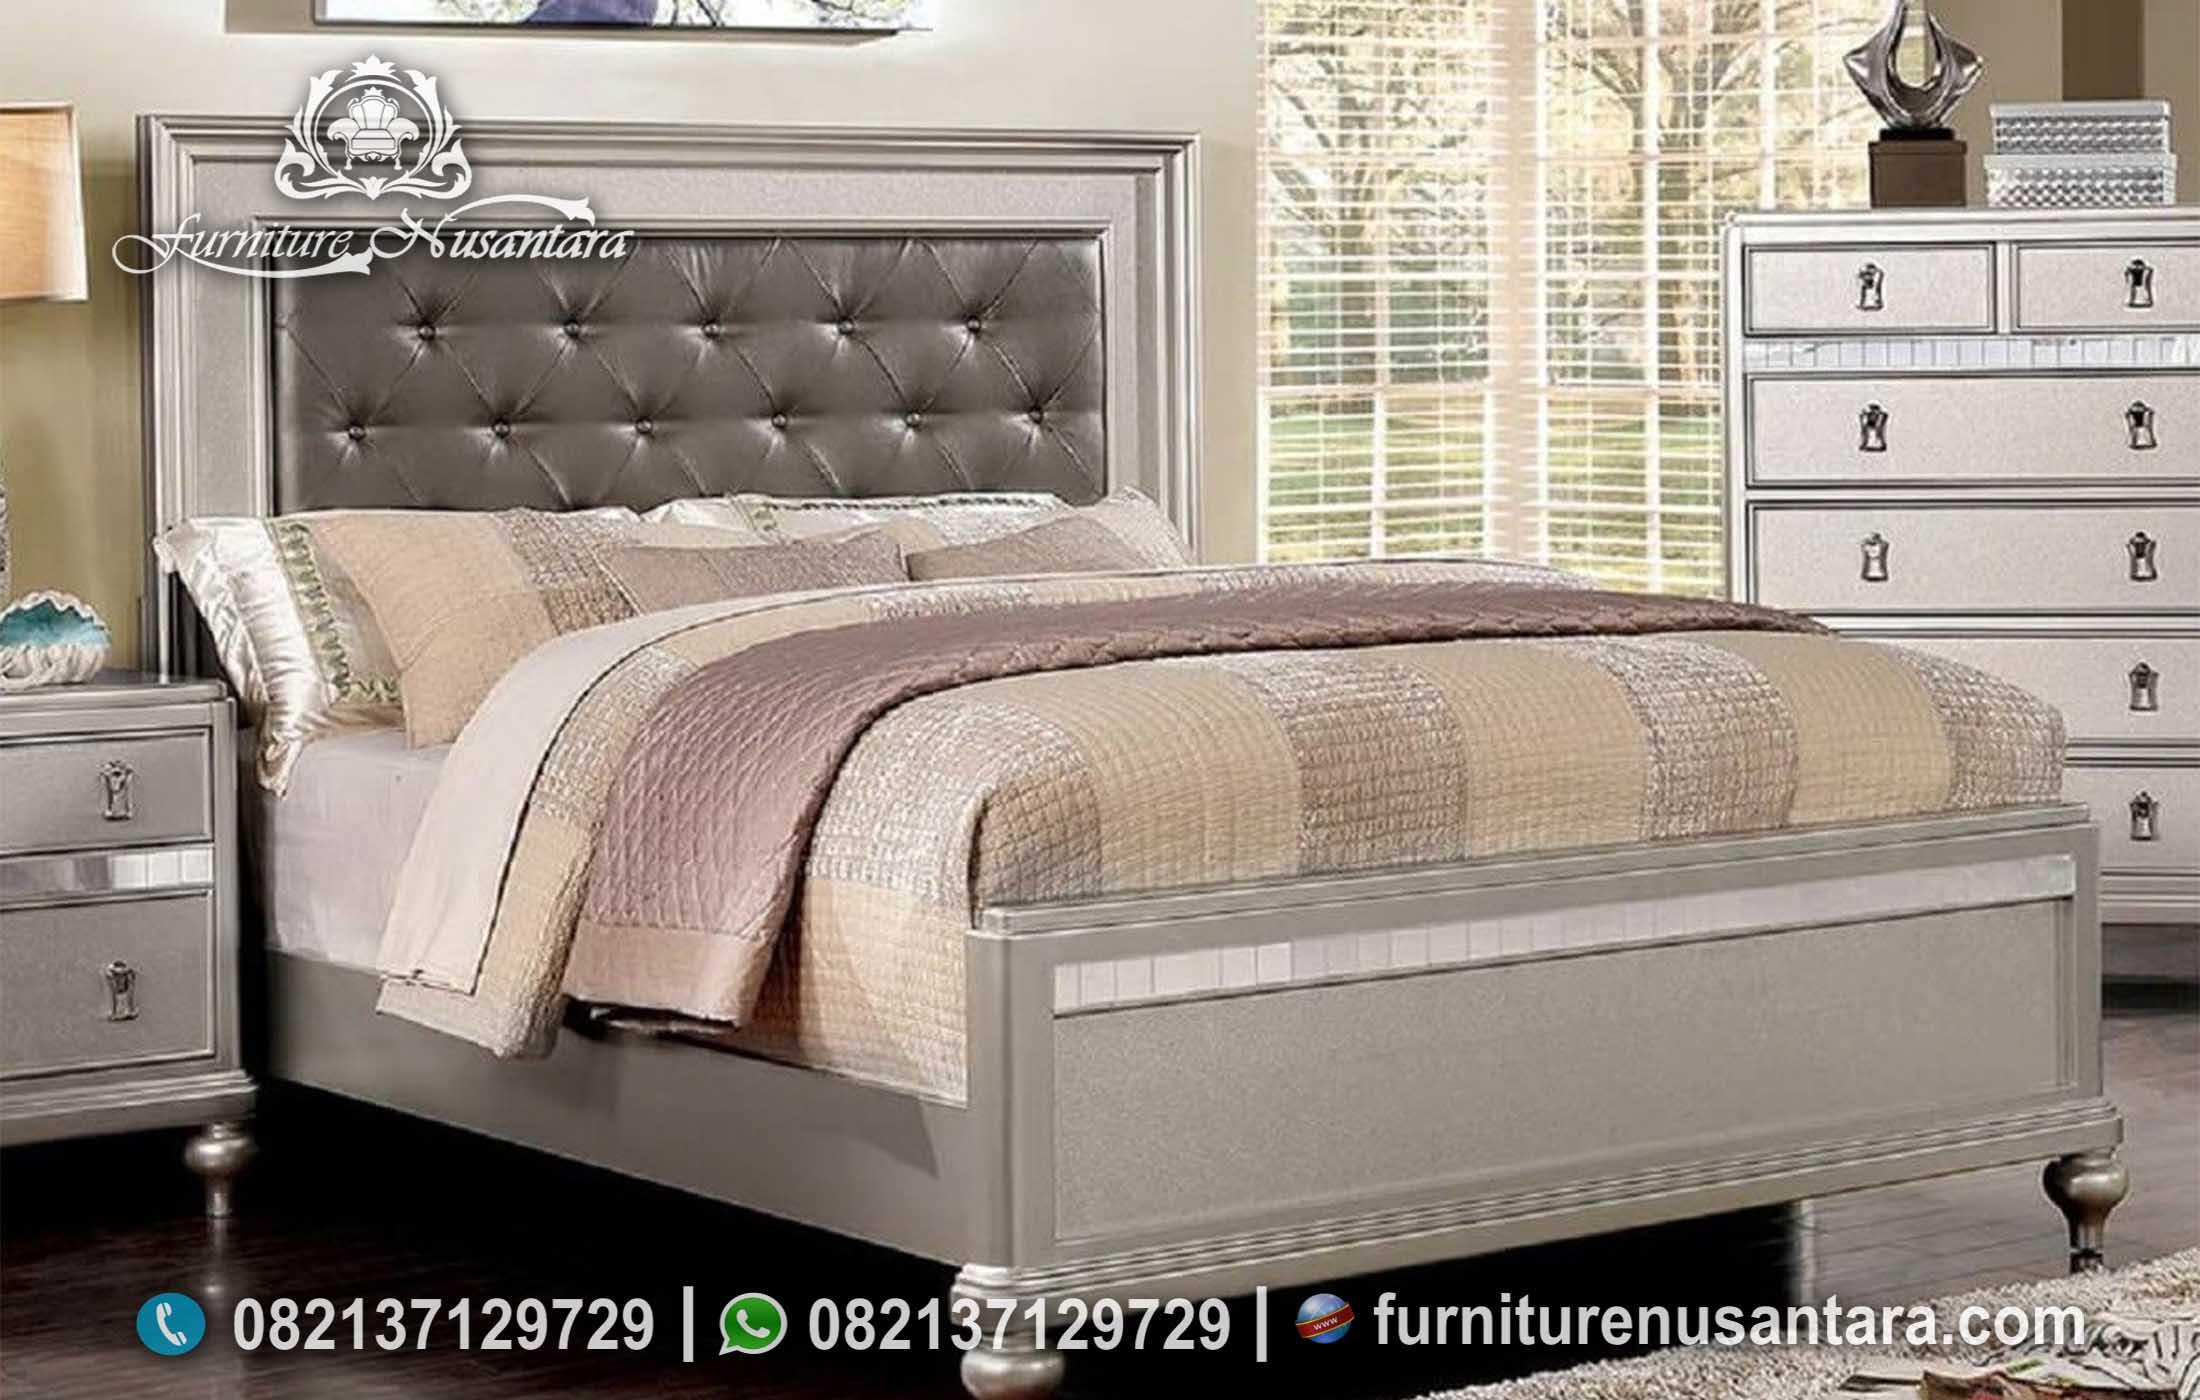 Kamar Set Minimalis Simple Harga Murah KS-223, Furniture Nusantara